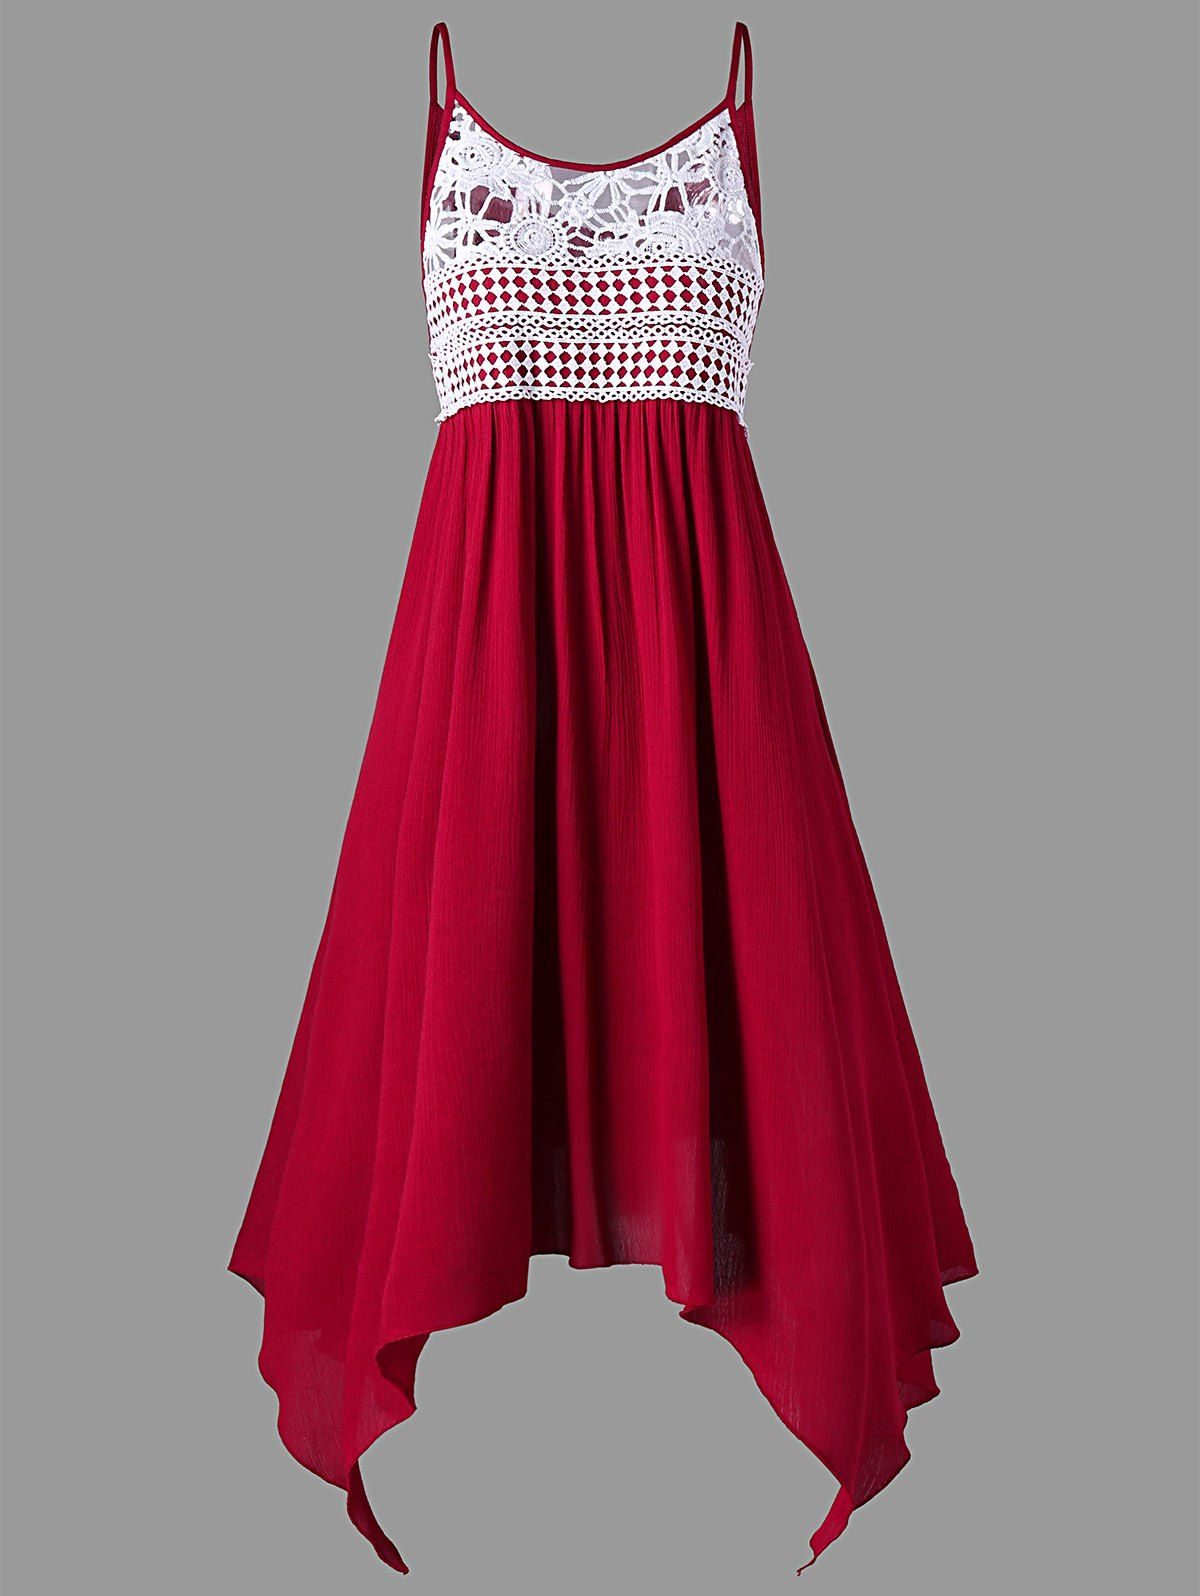 Lace panel plus size asymmetrical slip dress prom dresses rosegal